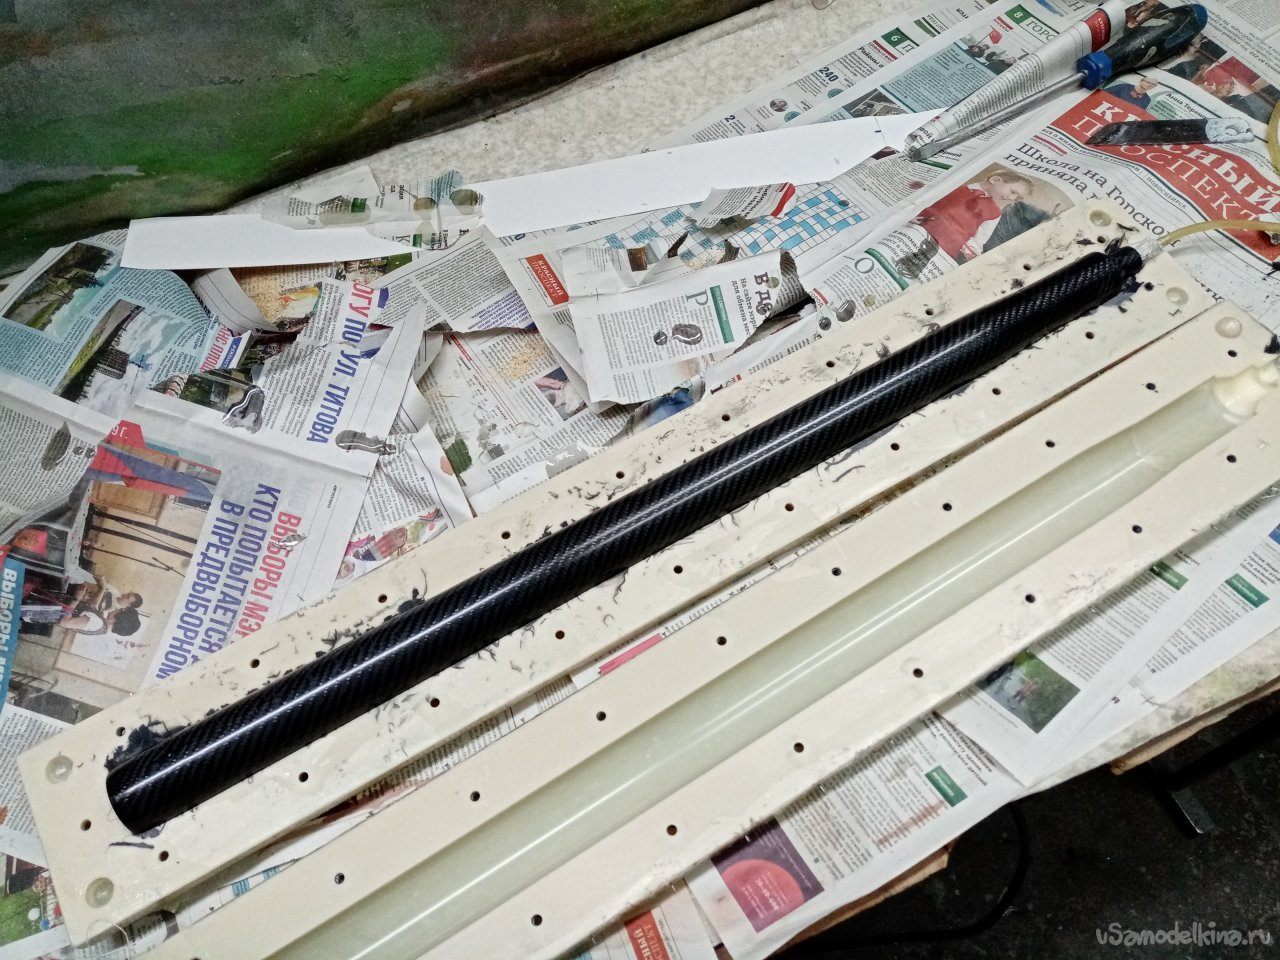 F5J class glider carbon fuselage bookmark